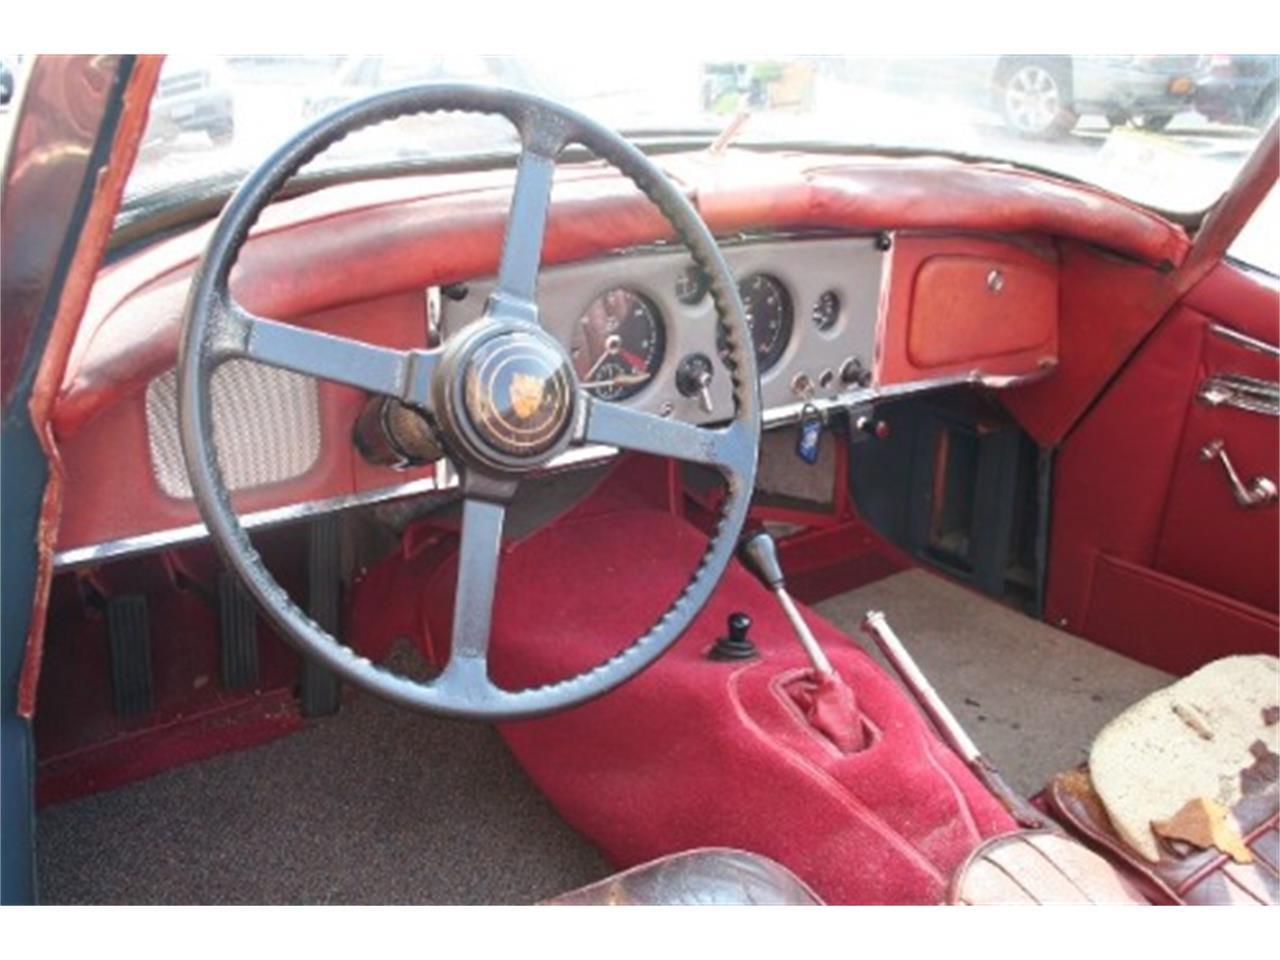 1959 Jaguar XK150 (CC-1320239) for sale in Astoria, New York